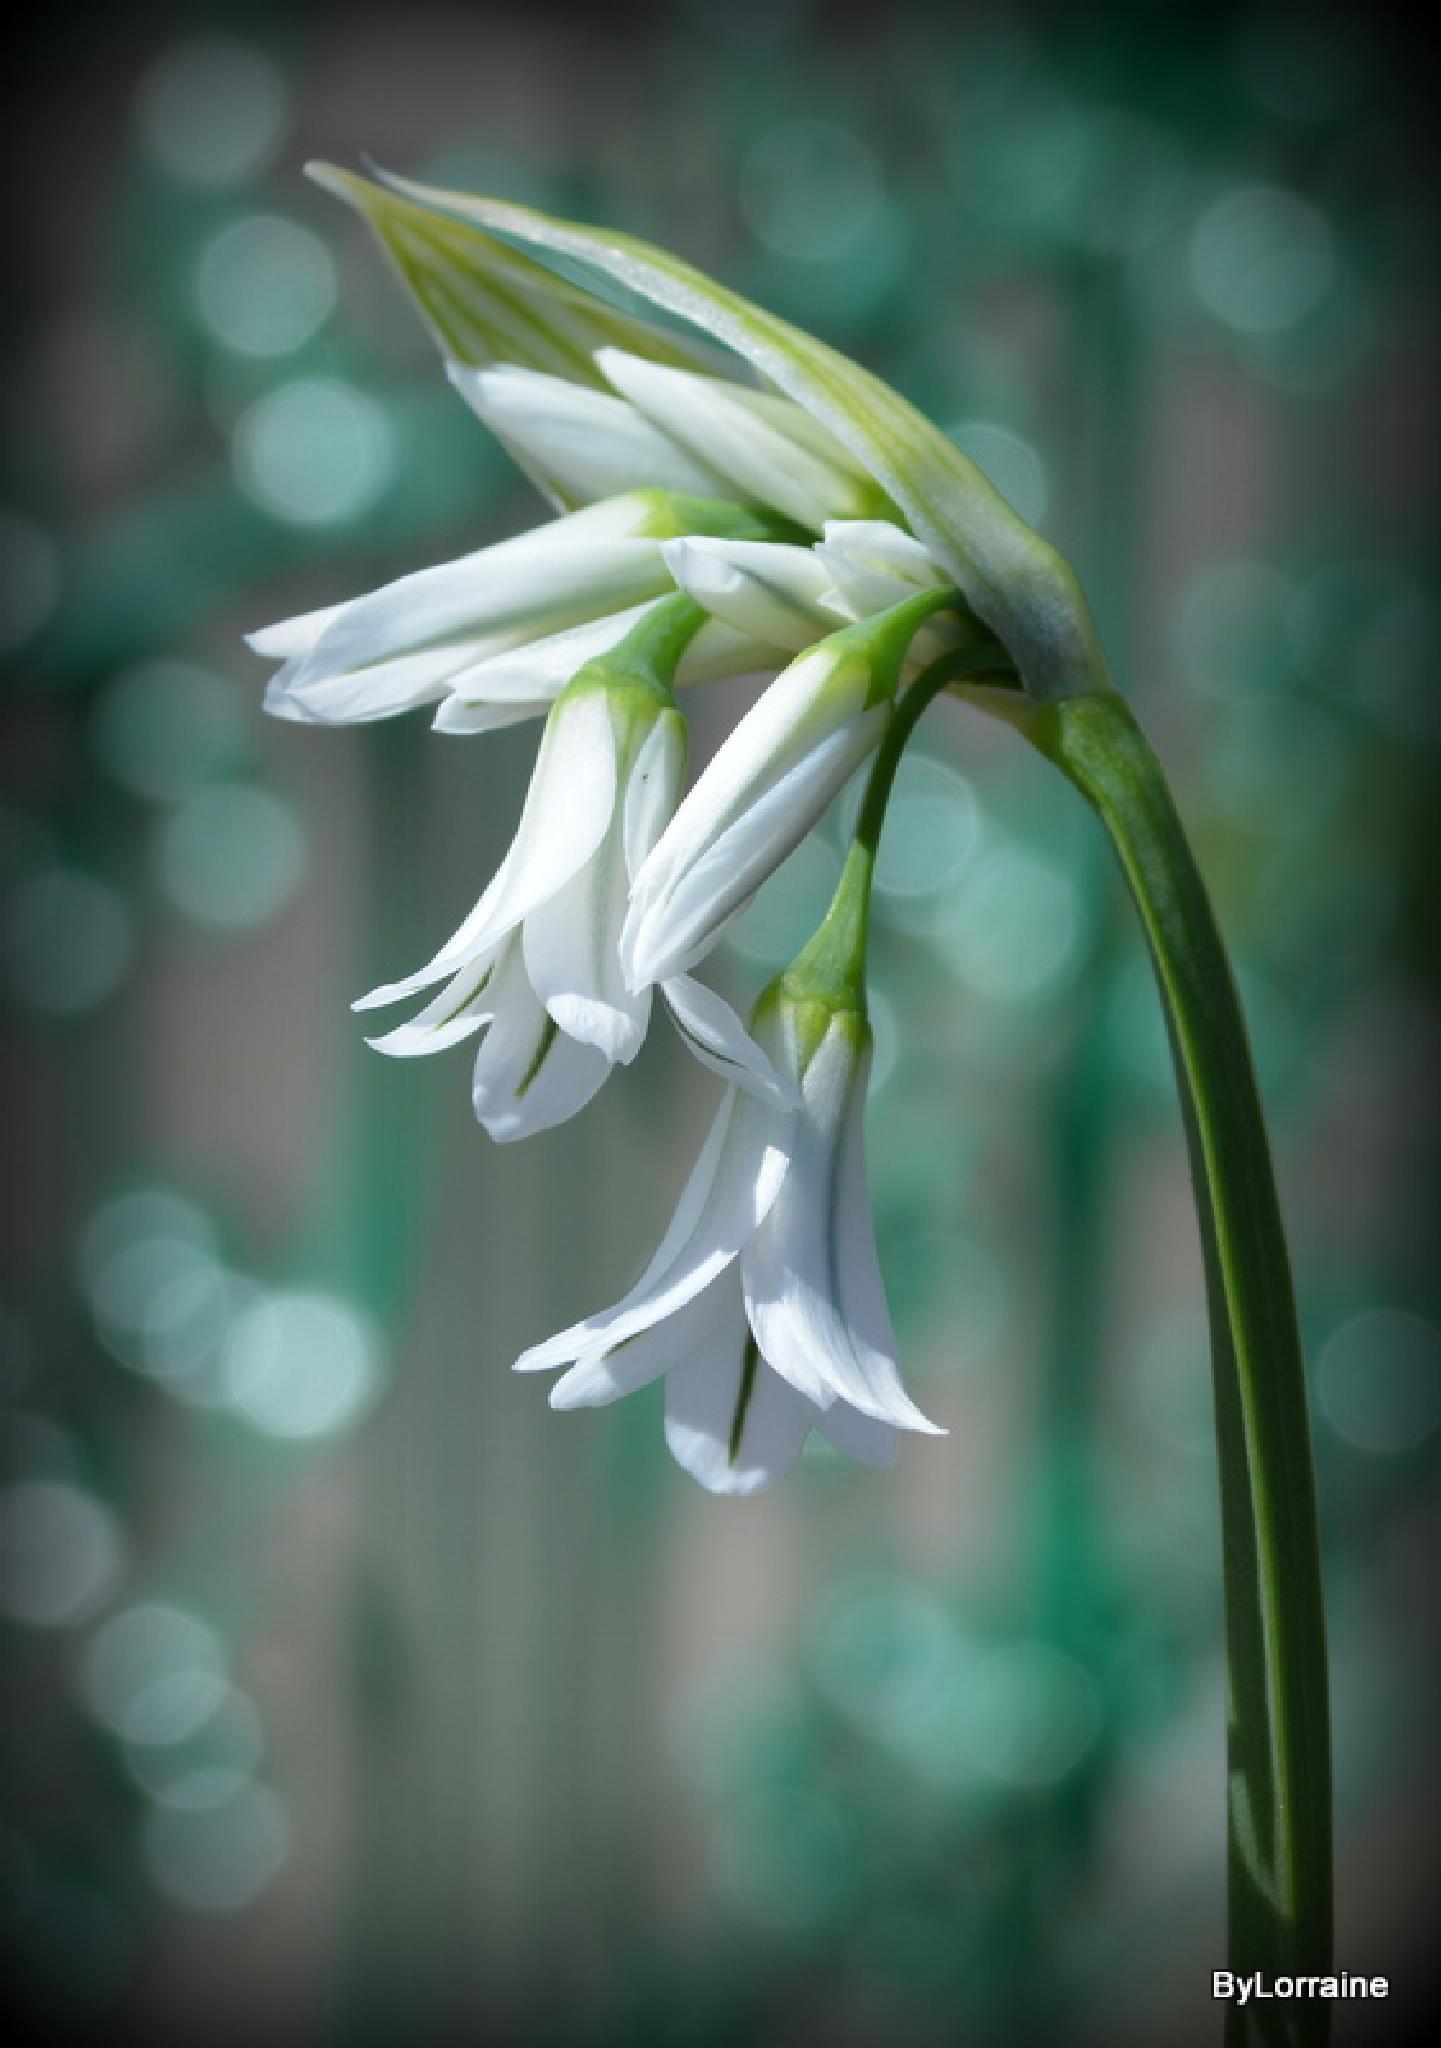 Garlic Flowers by Lorraine. Sgt